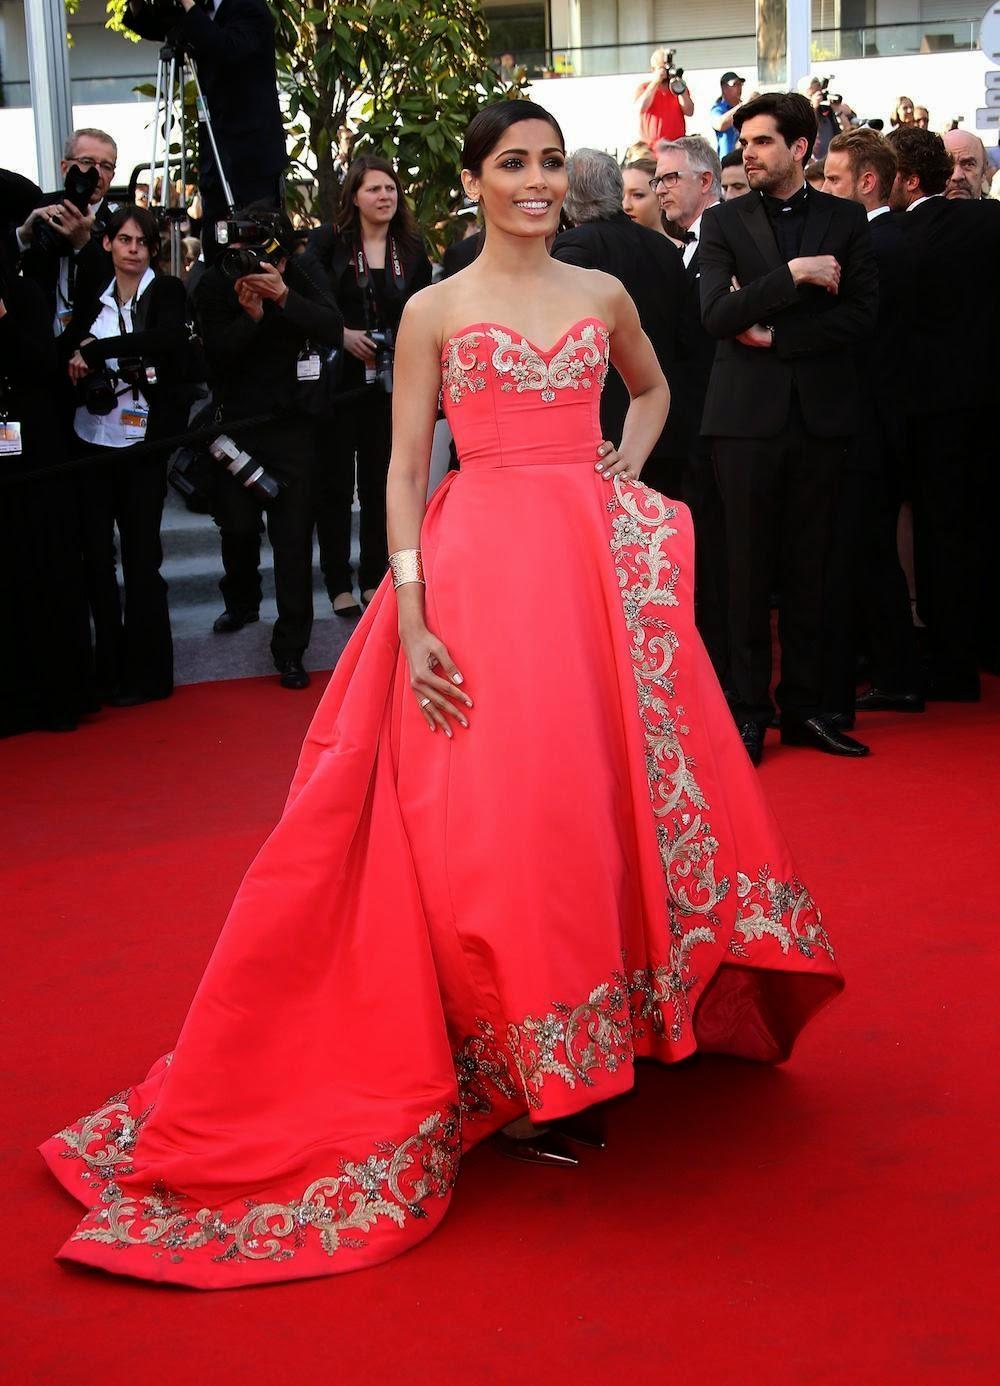 LOOKandLOVEwithLOLO: Top 12 Oscar de la Renta Red Carpet Looks